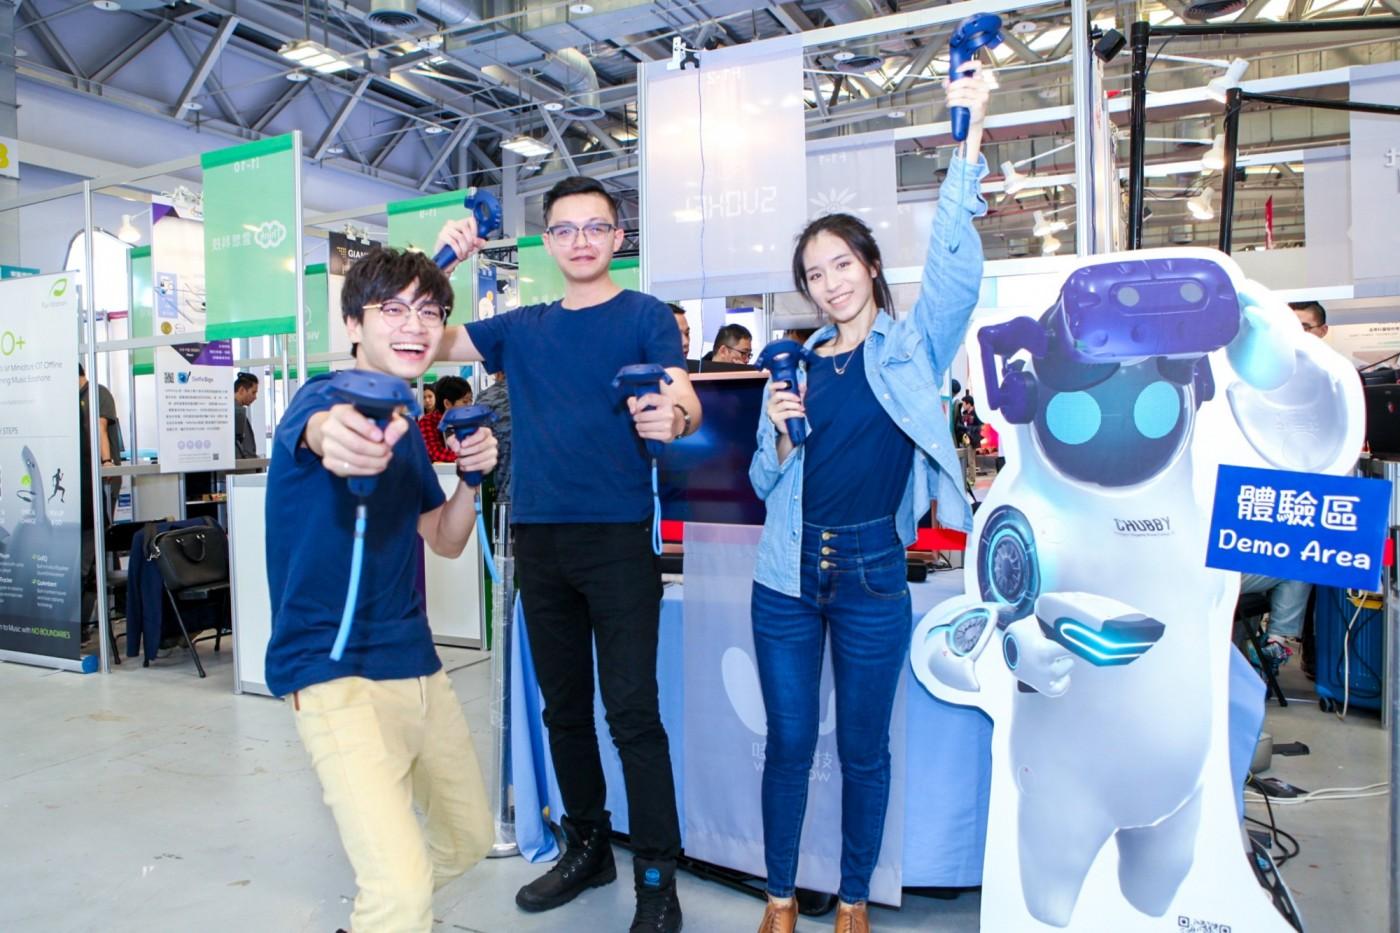 【2018 Meet Taipei】國發會副主委也玩嗨!直擊遊走現實與虛擬的Funtech&XR展區